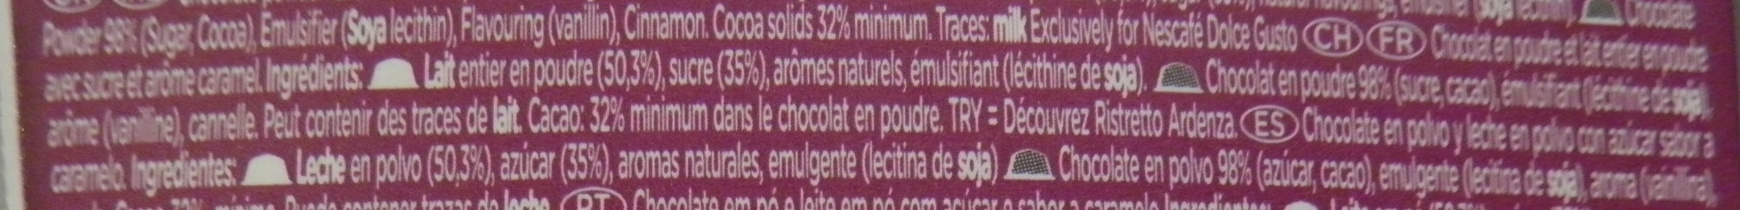 Nescafé Dolce Gusto Chococino Caramel - Ingredients - fr